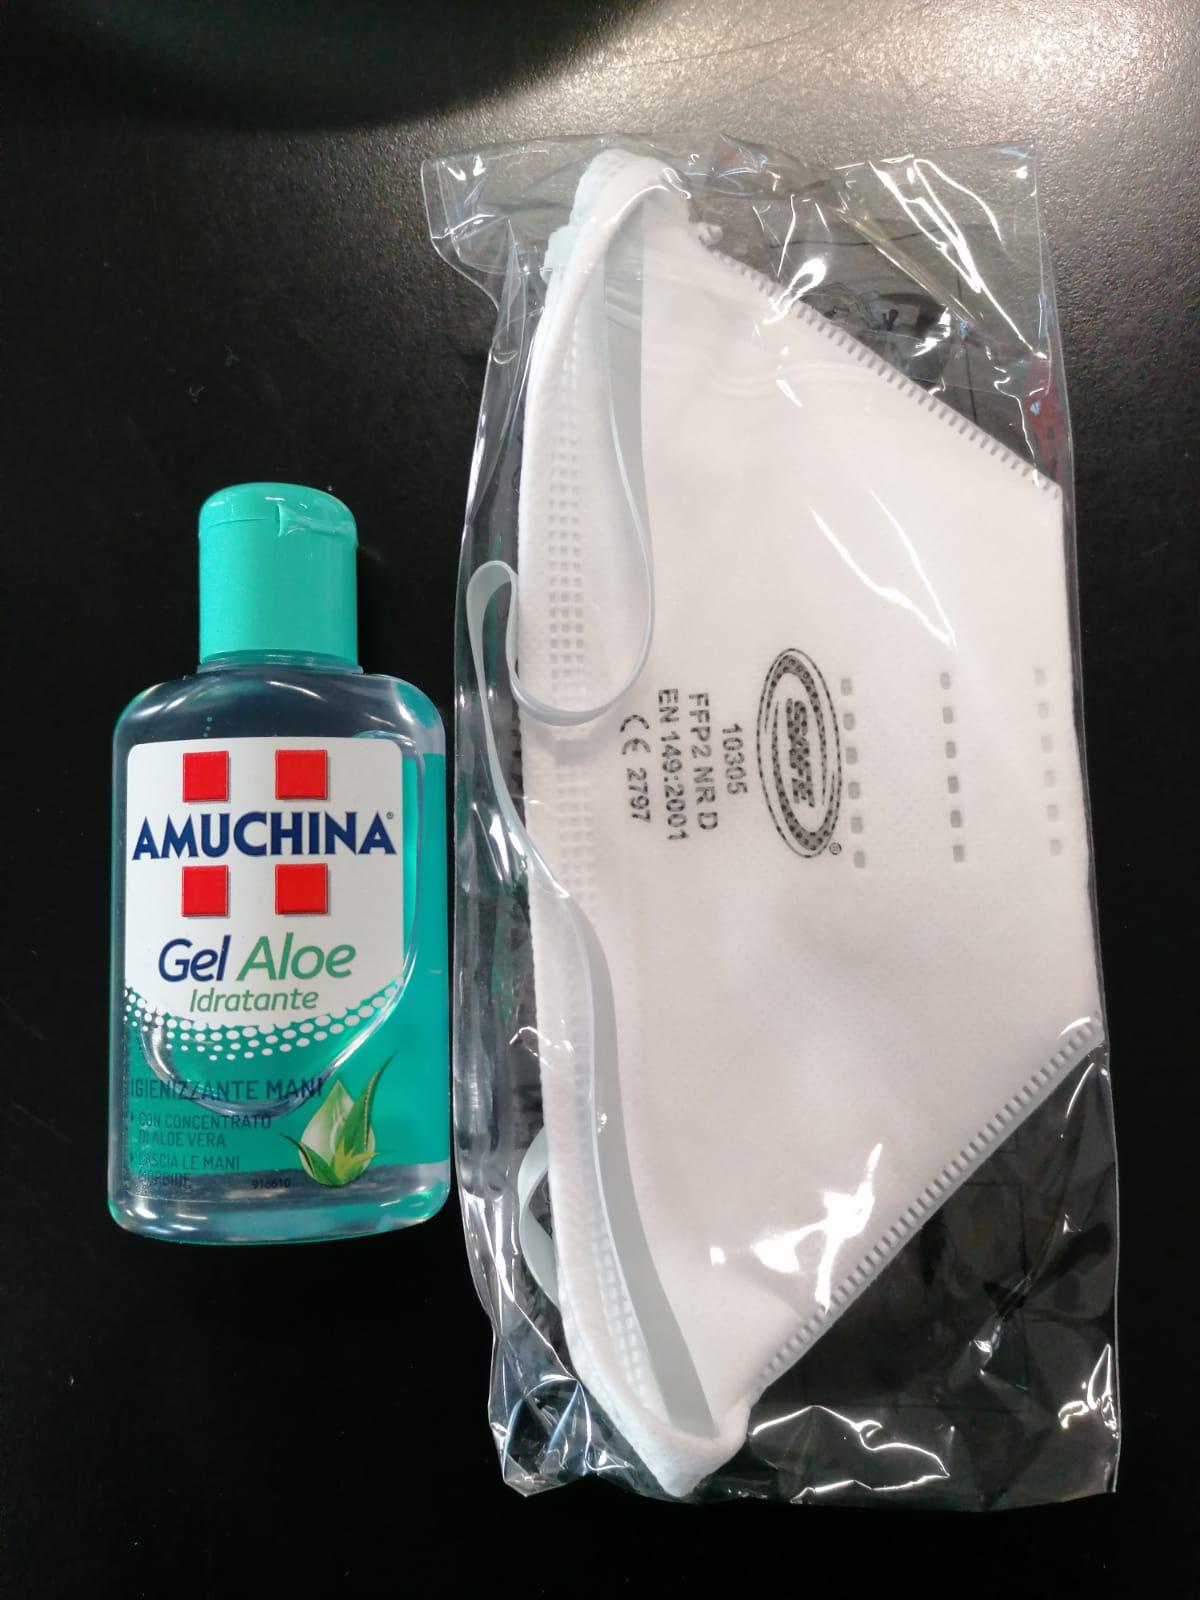 AMUCHINA GEL ALOE 80 ML + MASCHERINA FFP2